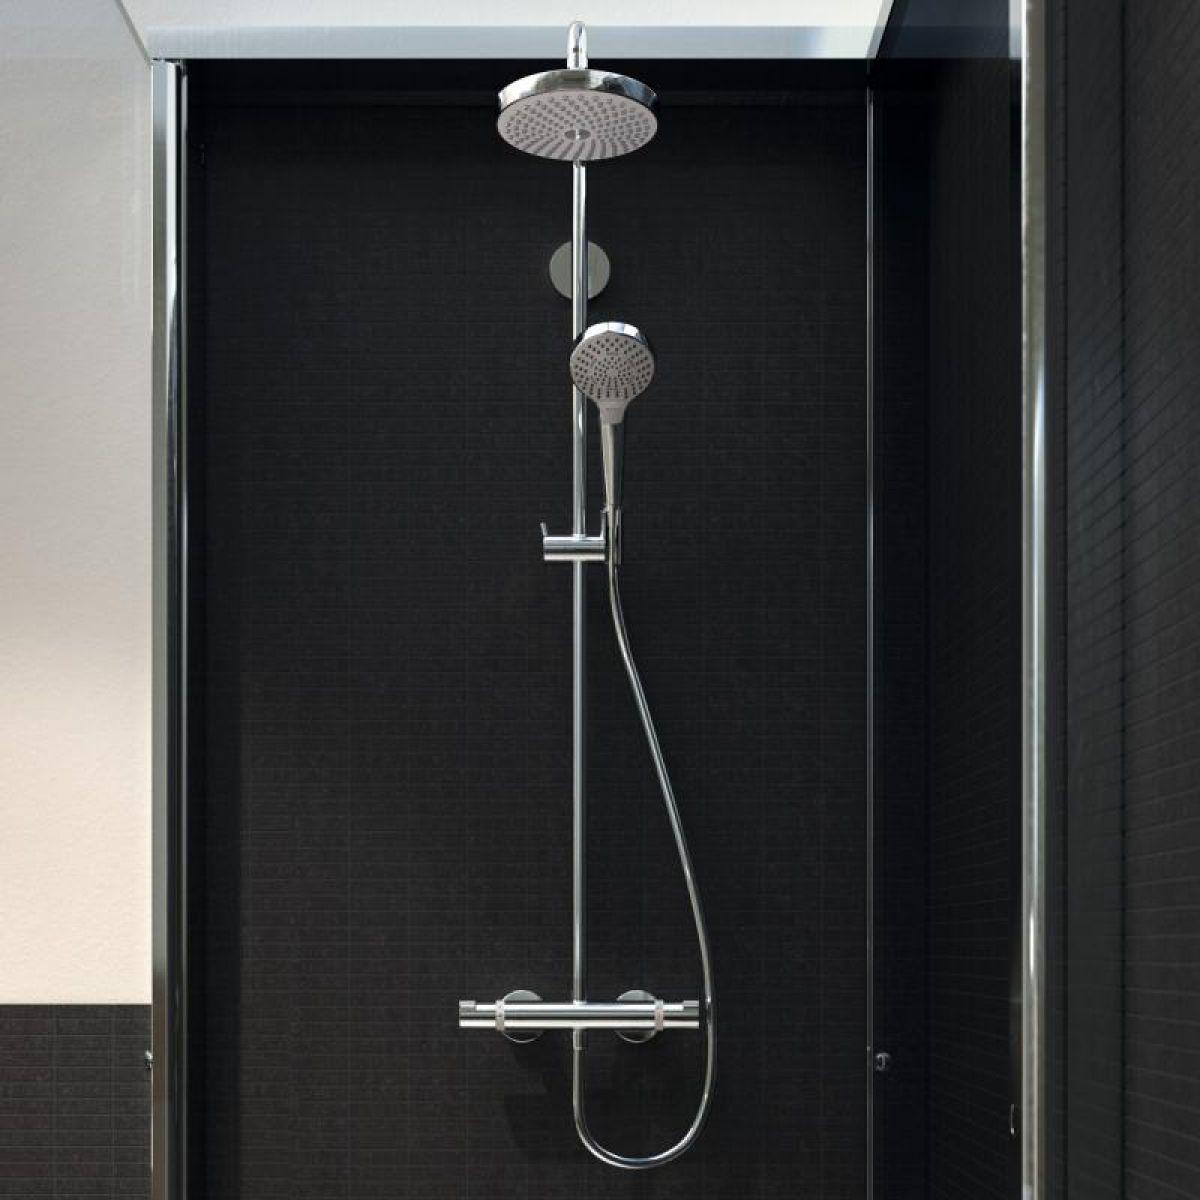 hansgrohe raindance select s 240 1jet showerpipe uk. Black Bedroom Furniture Sets. Home Design Ideas